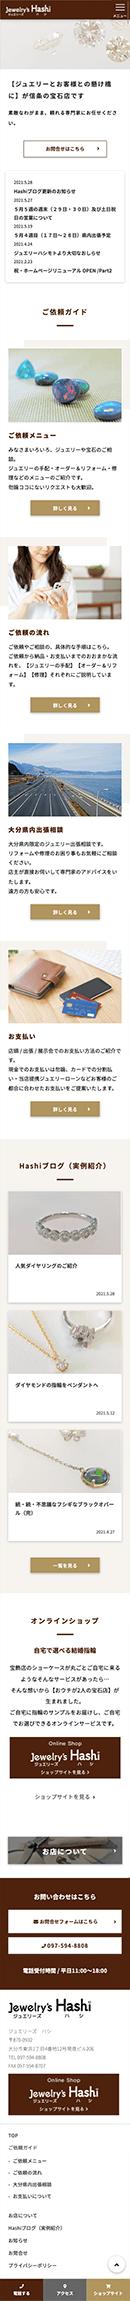 Webマーケティング_制作実績_ジュエリーズ Hashi_3